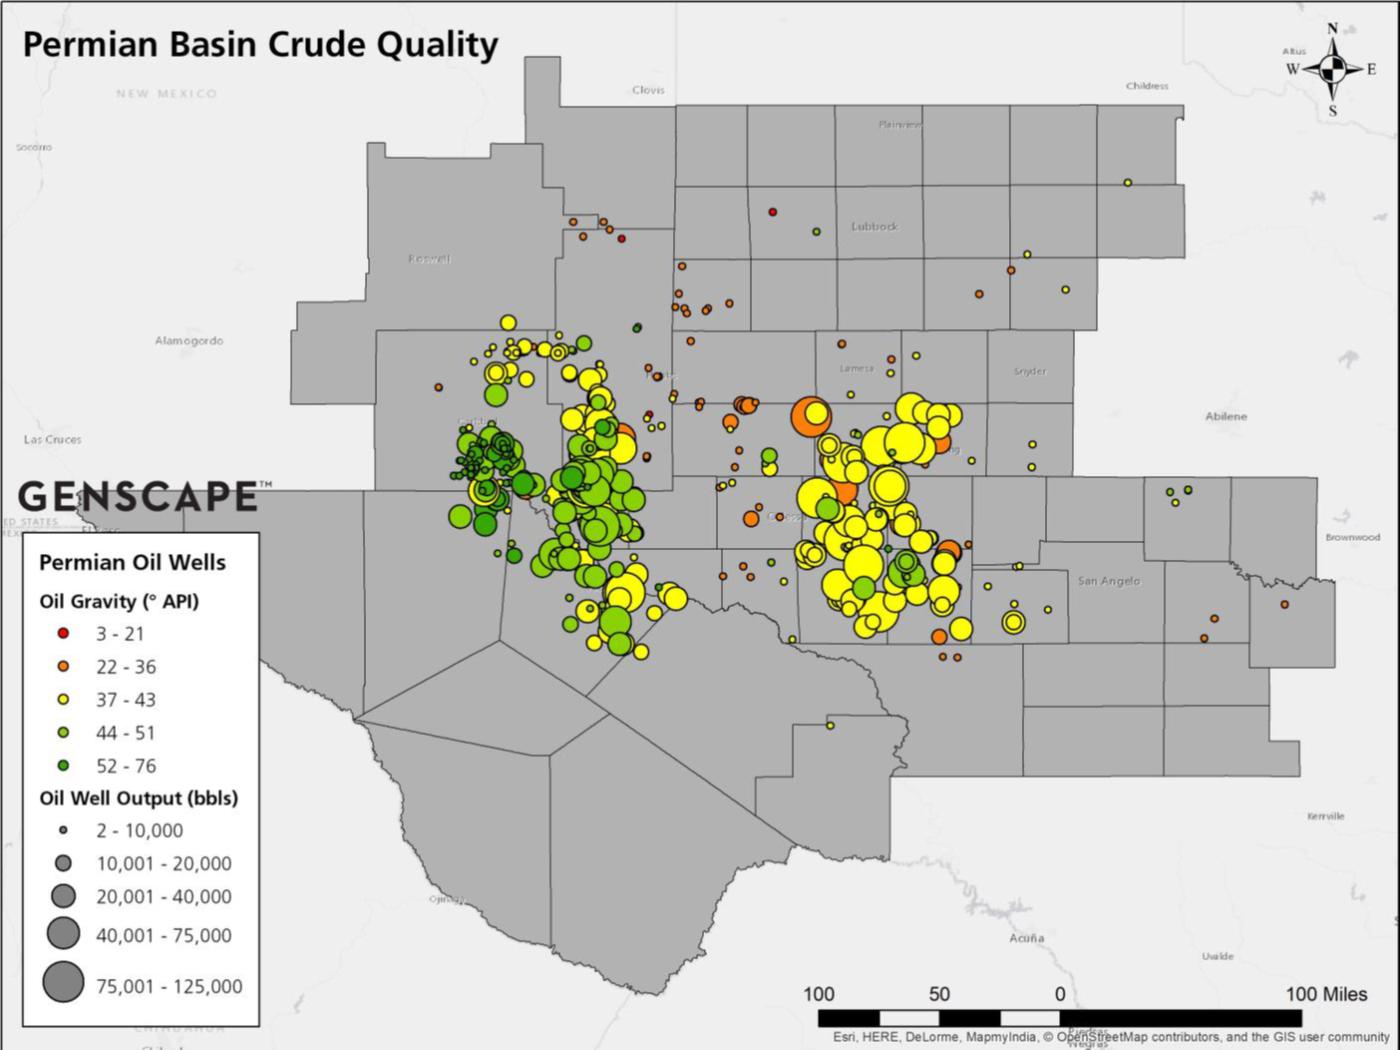 Permian Basin Crude Quality